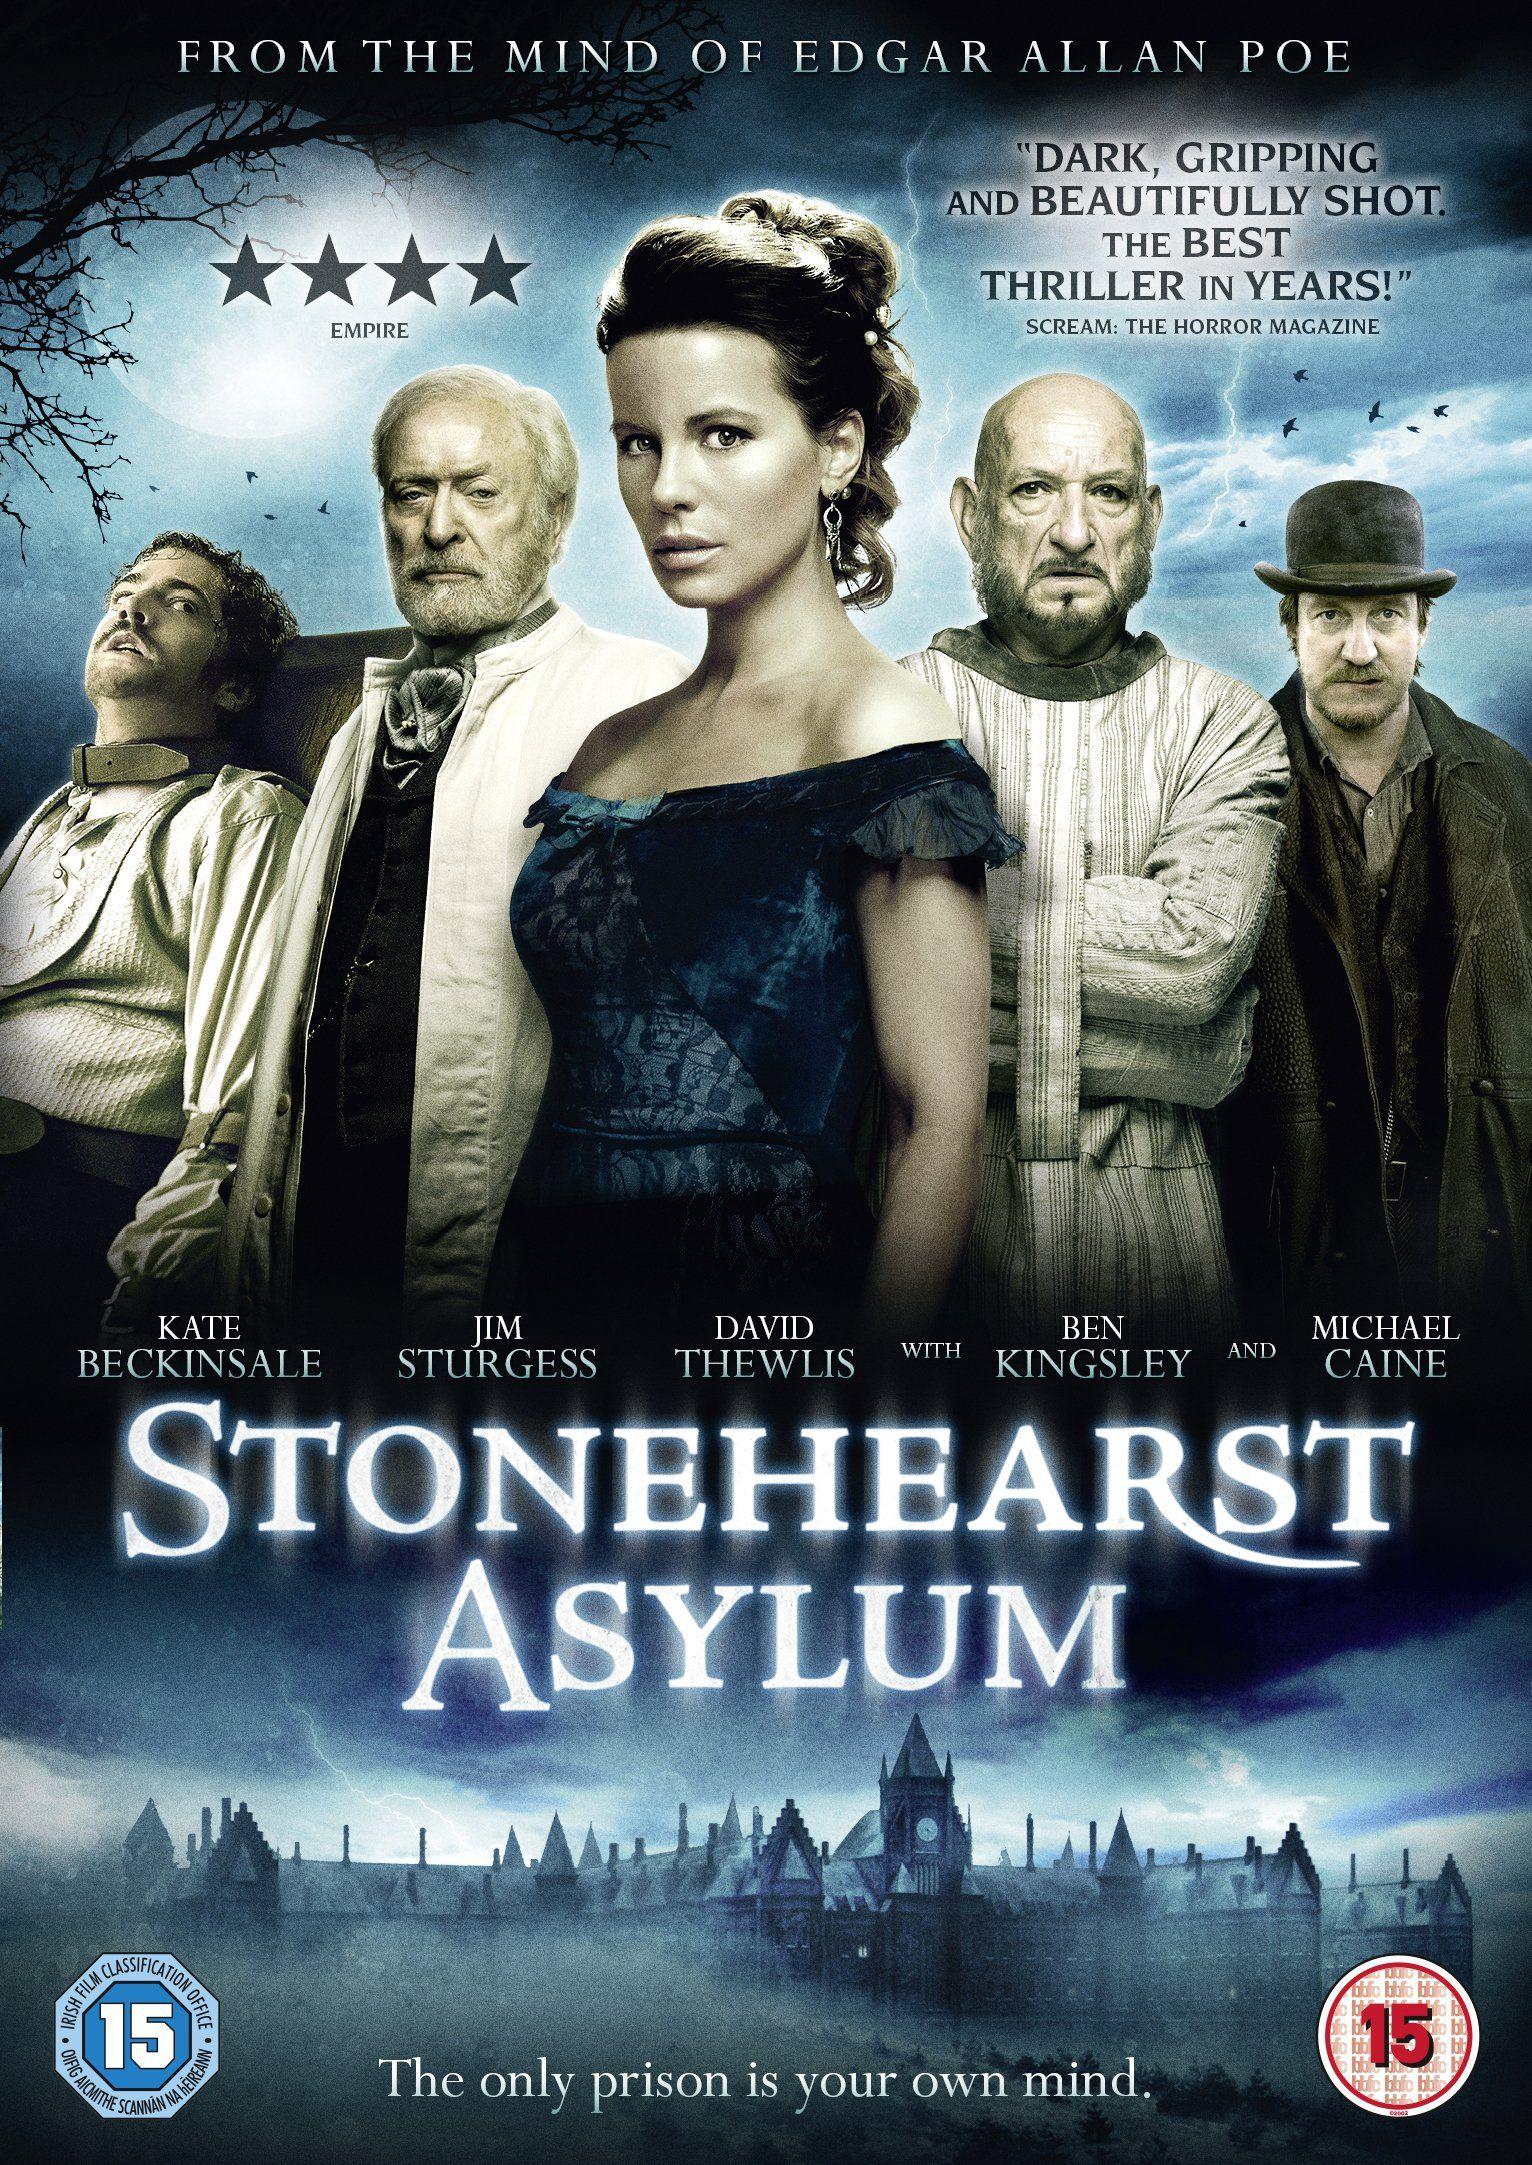 Stonehearst Asylum Asylum Inspiration For Dollhouse Pinterest